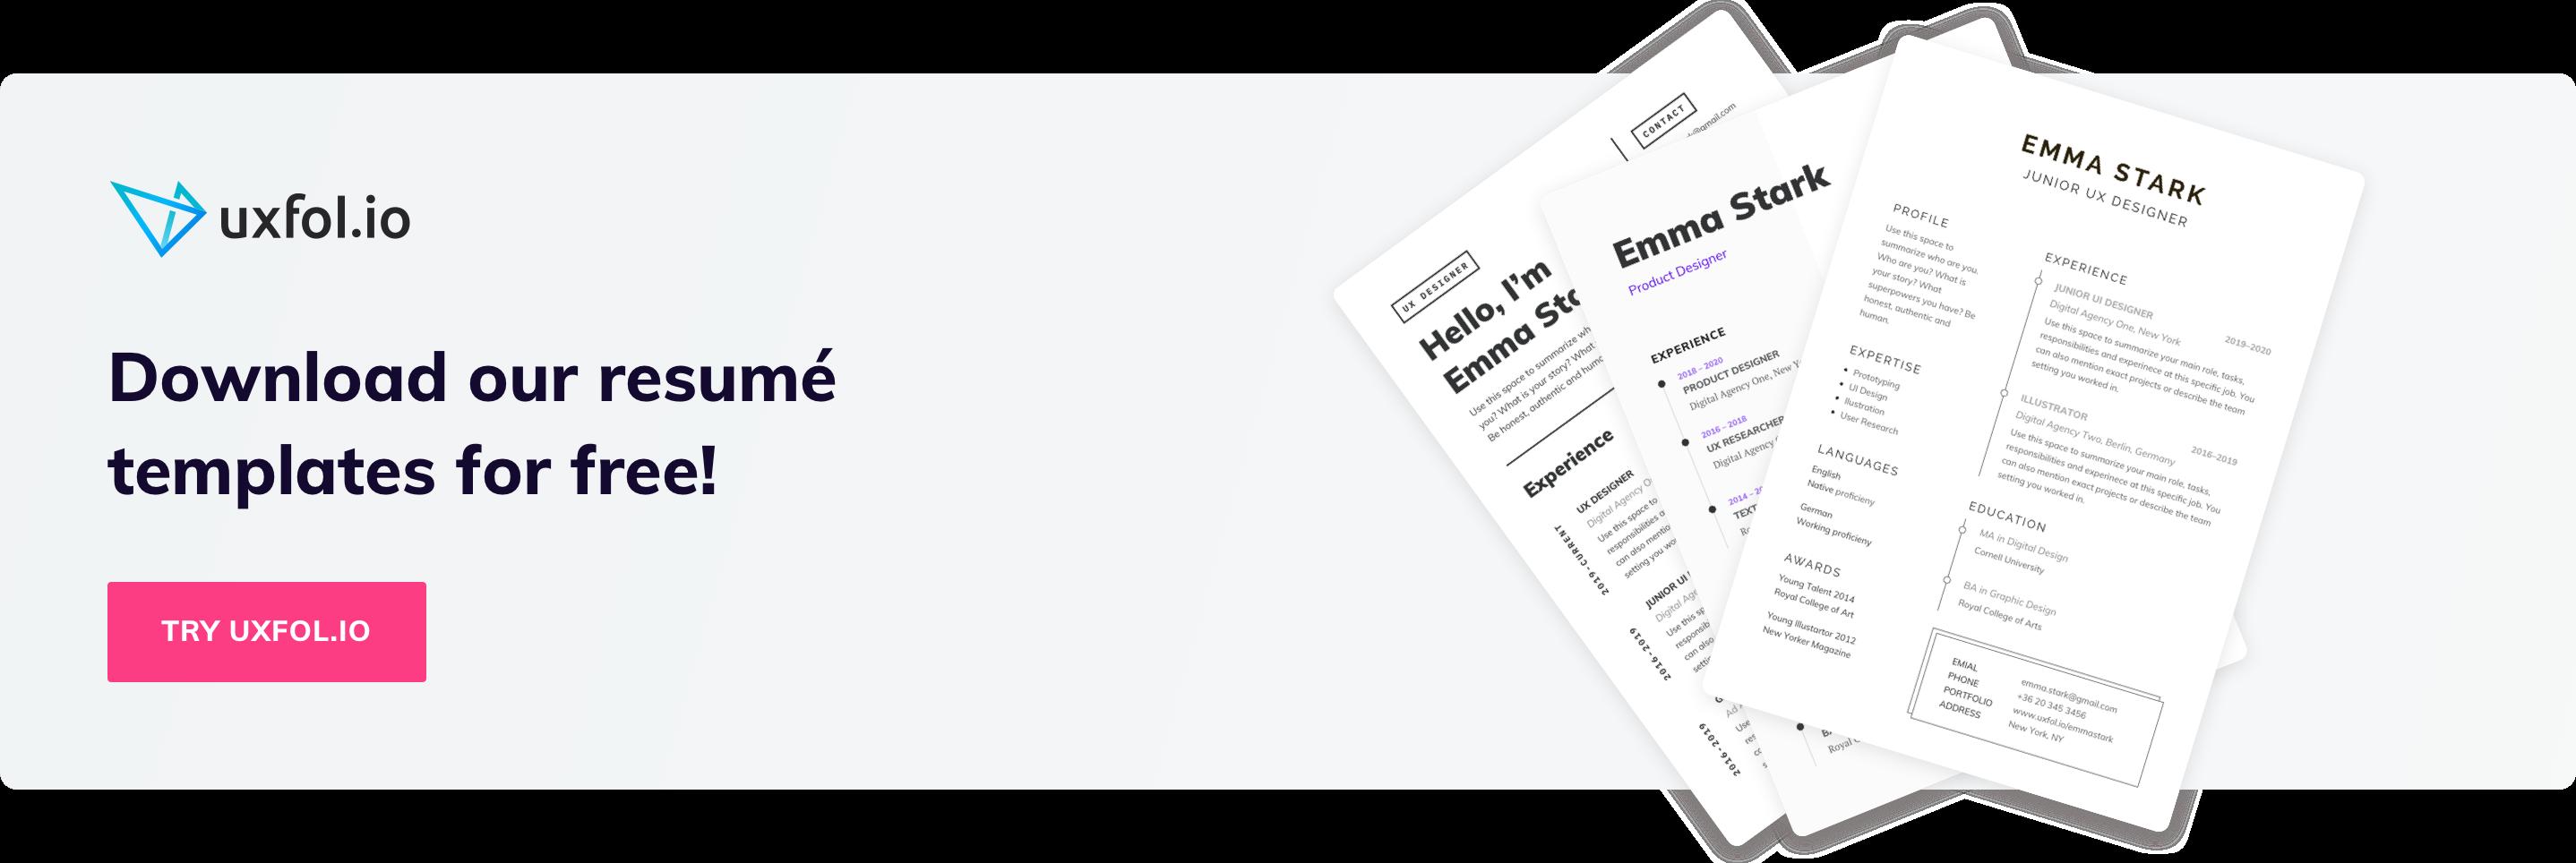 Ux Designer Resumes Hiring Managers Will Love Uxfol Io Blog